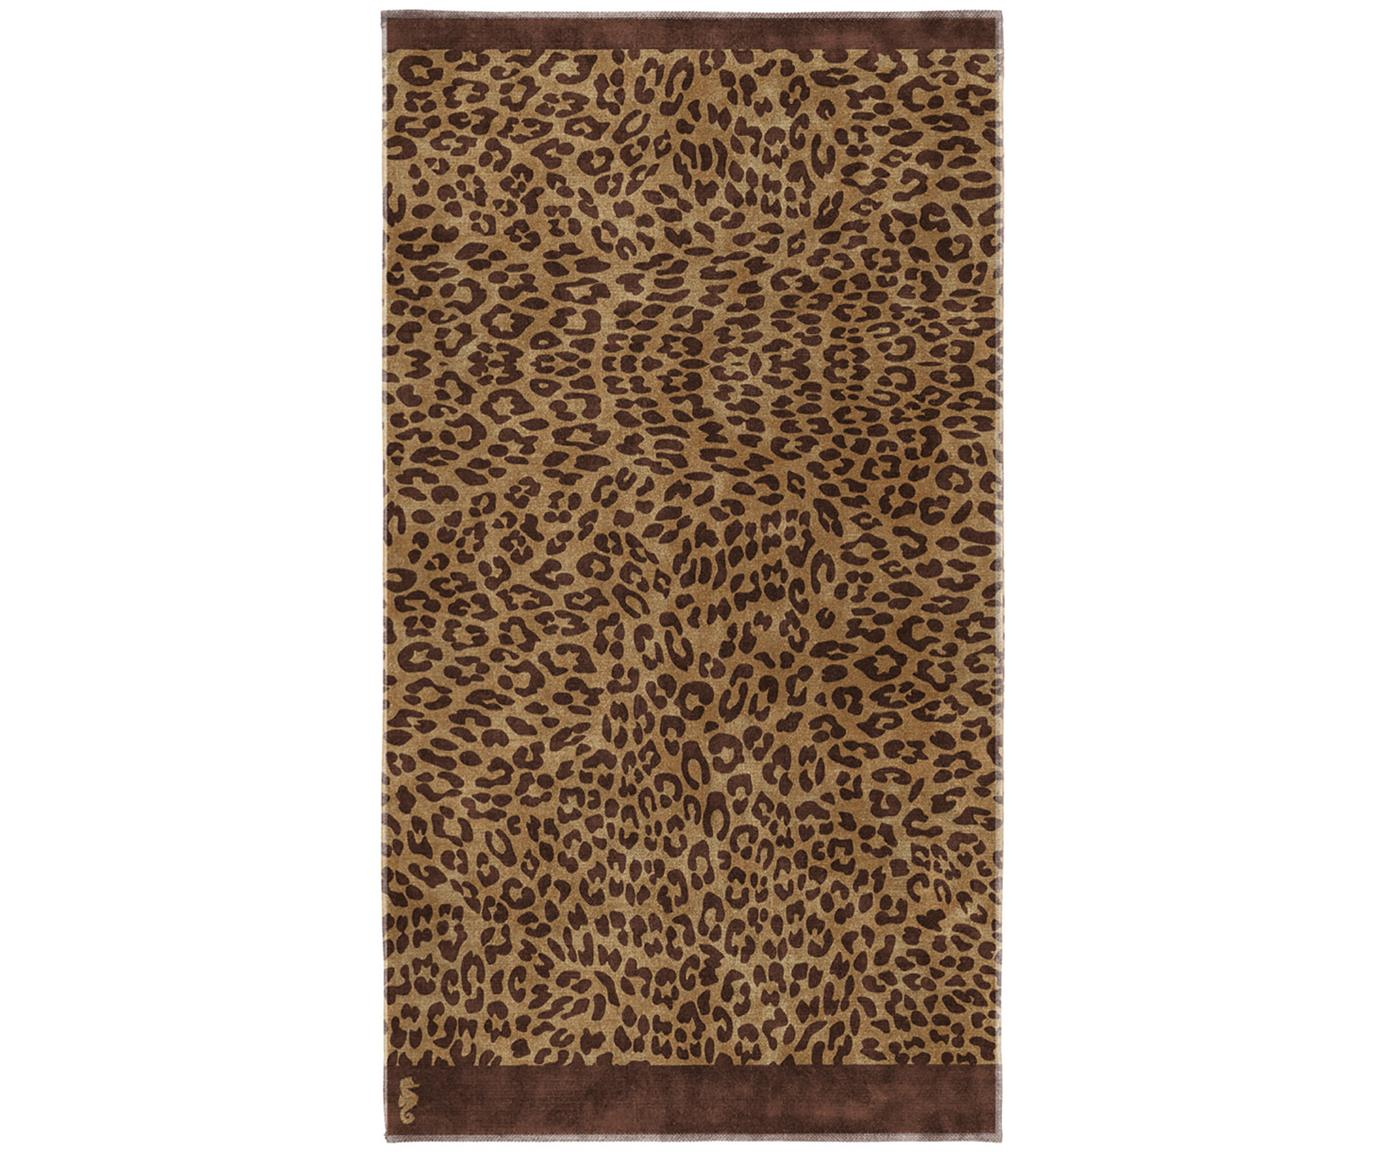 Telo mare con motivo animale Jaguar, Beige, marrone, Larg. 100 x Lung. 180 cm